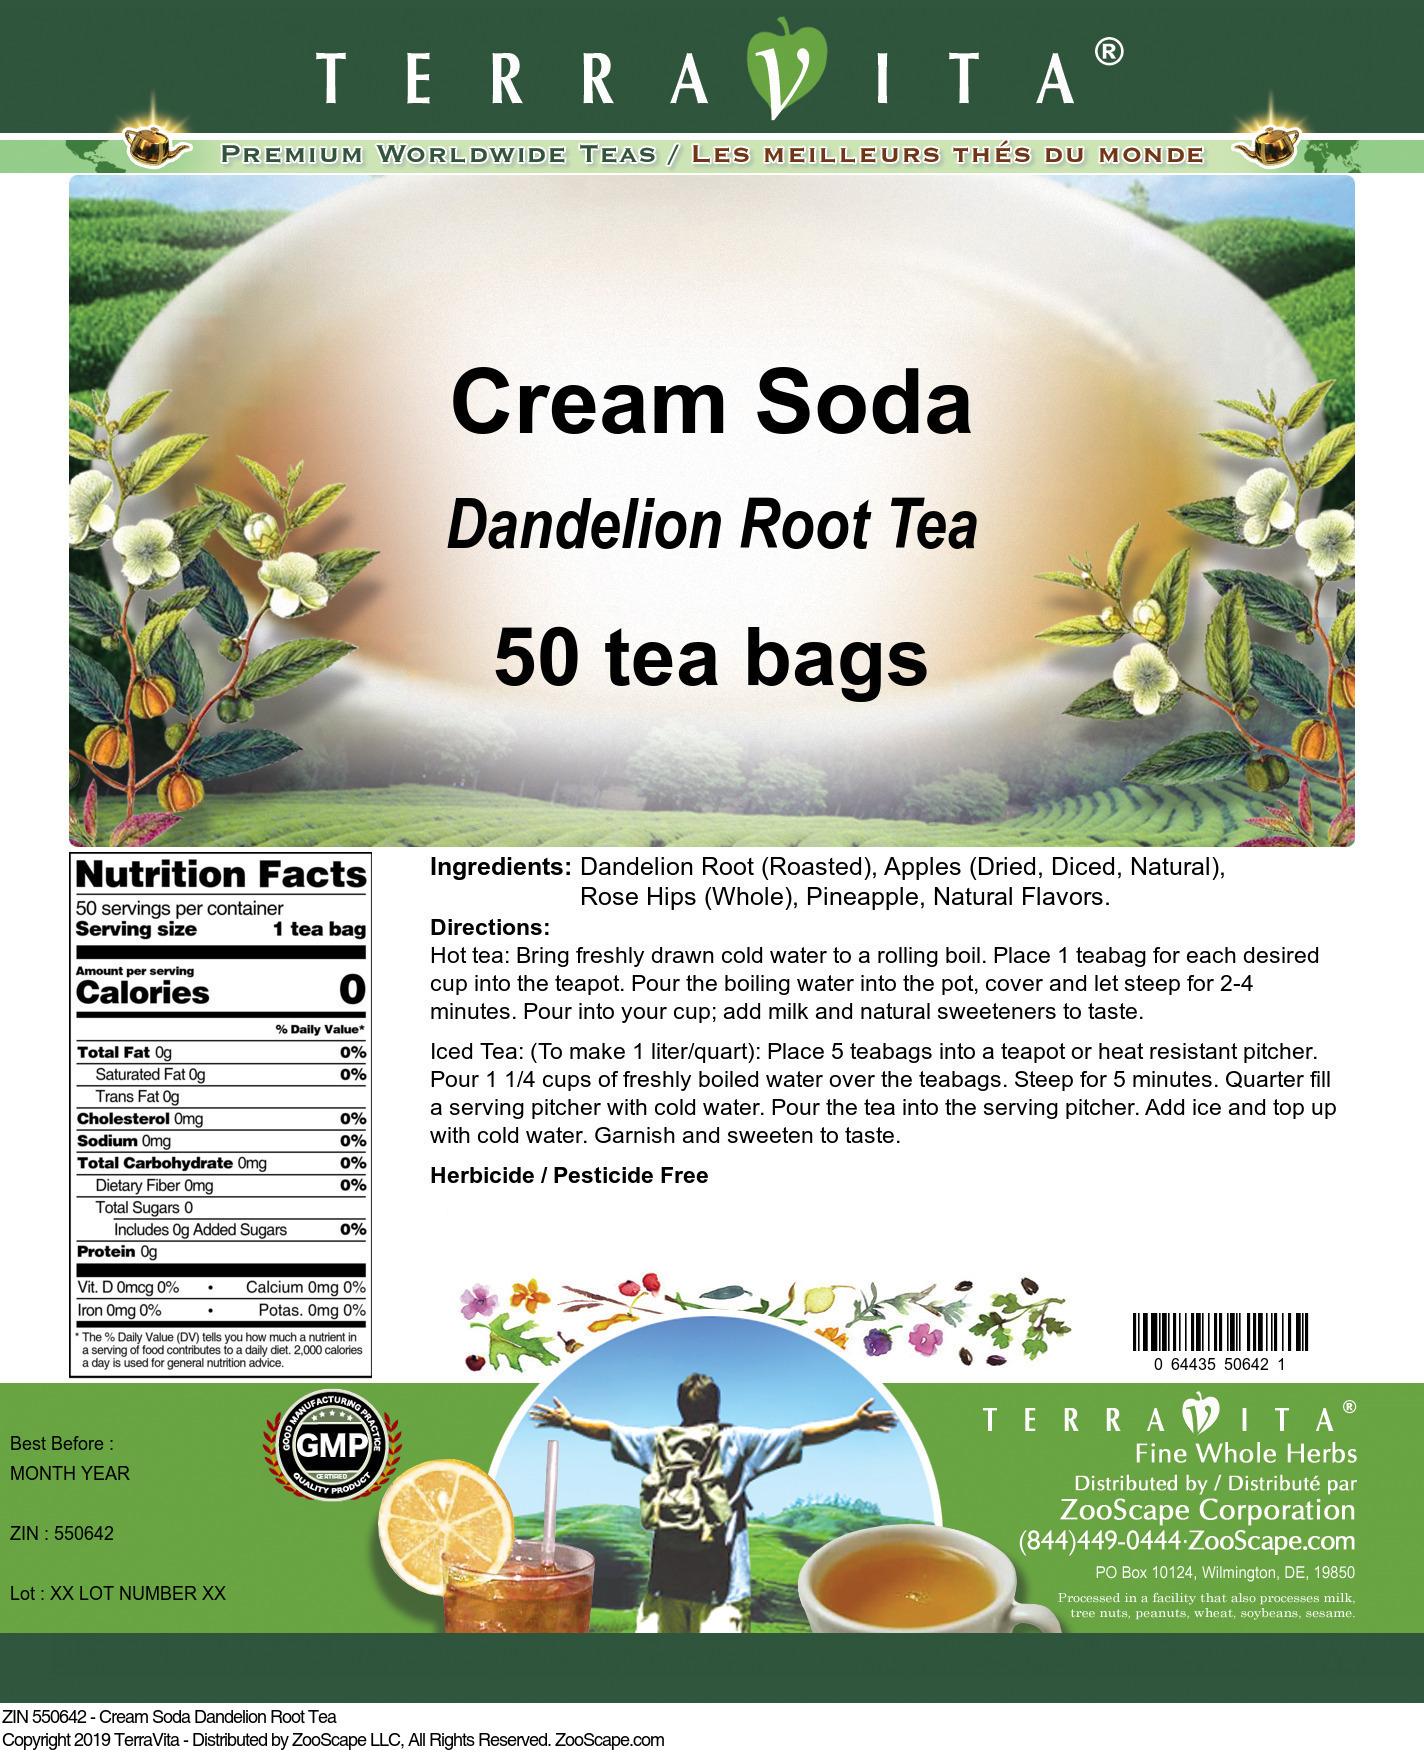 Cream Soda Dandelion Root